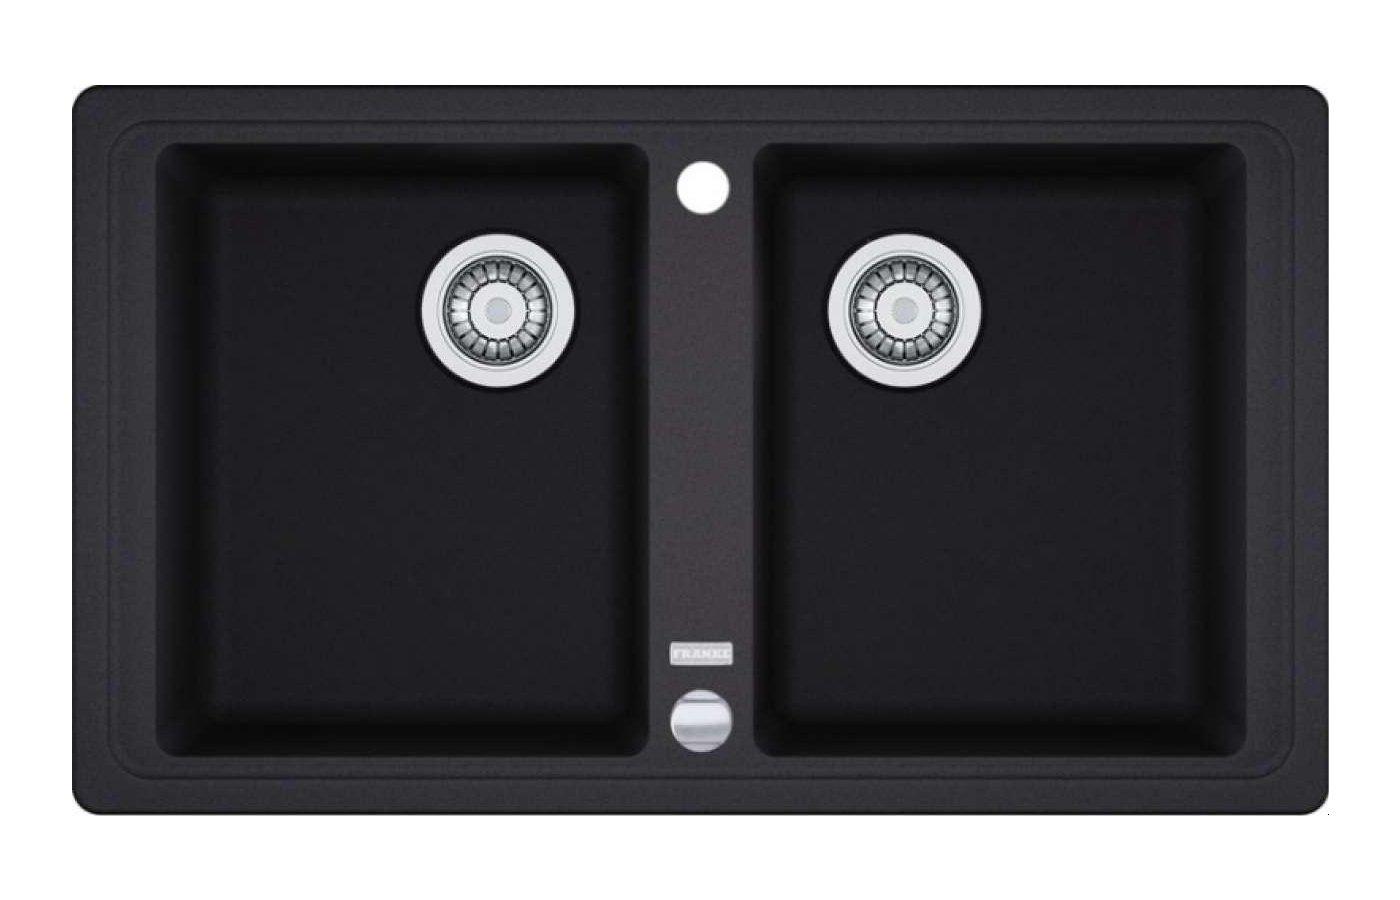 Кухонная мойка FRANKE BFG 620 оникс